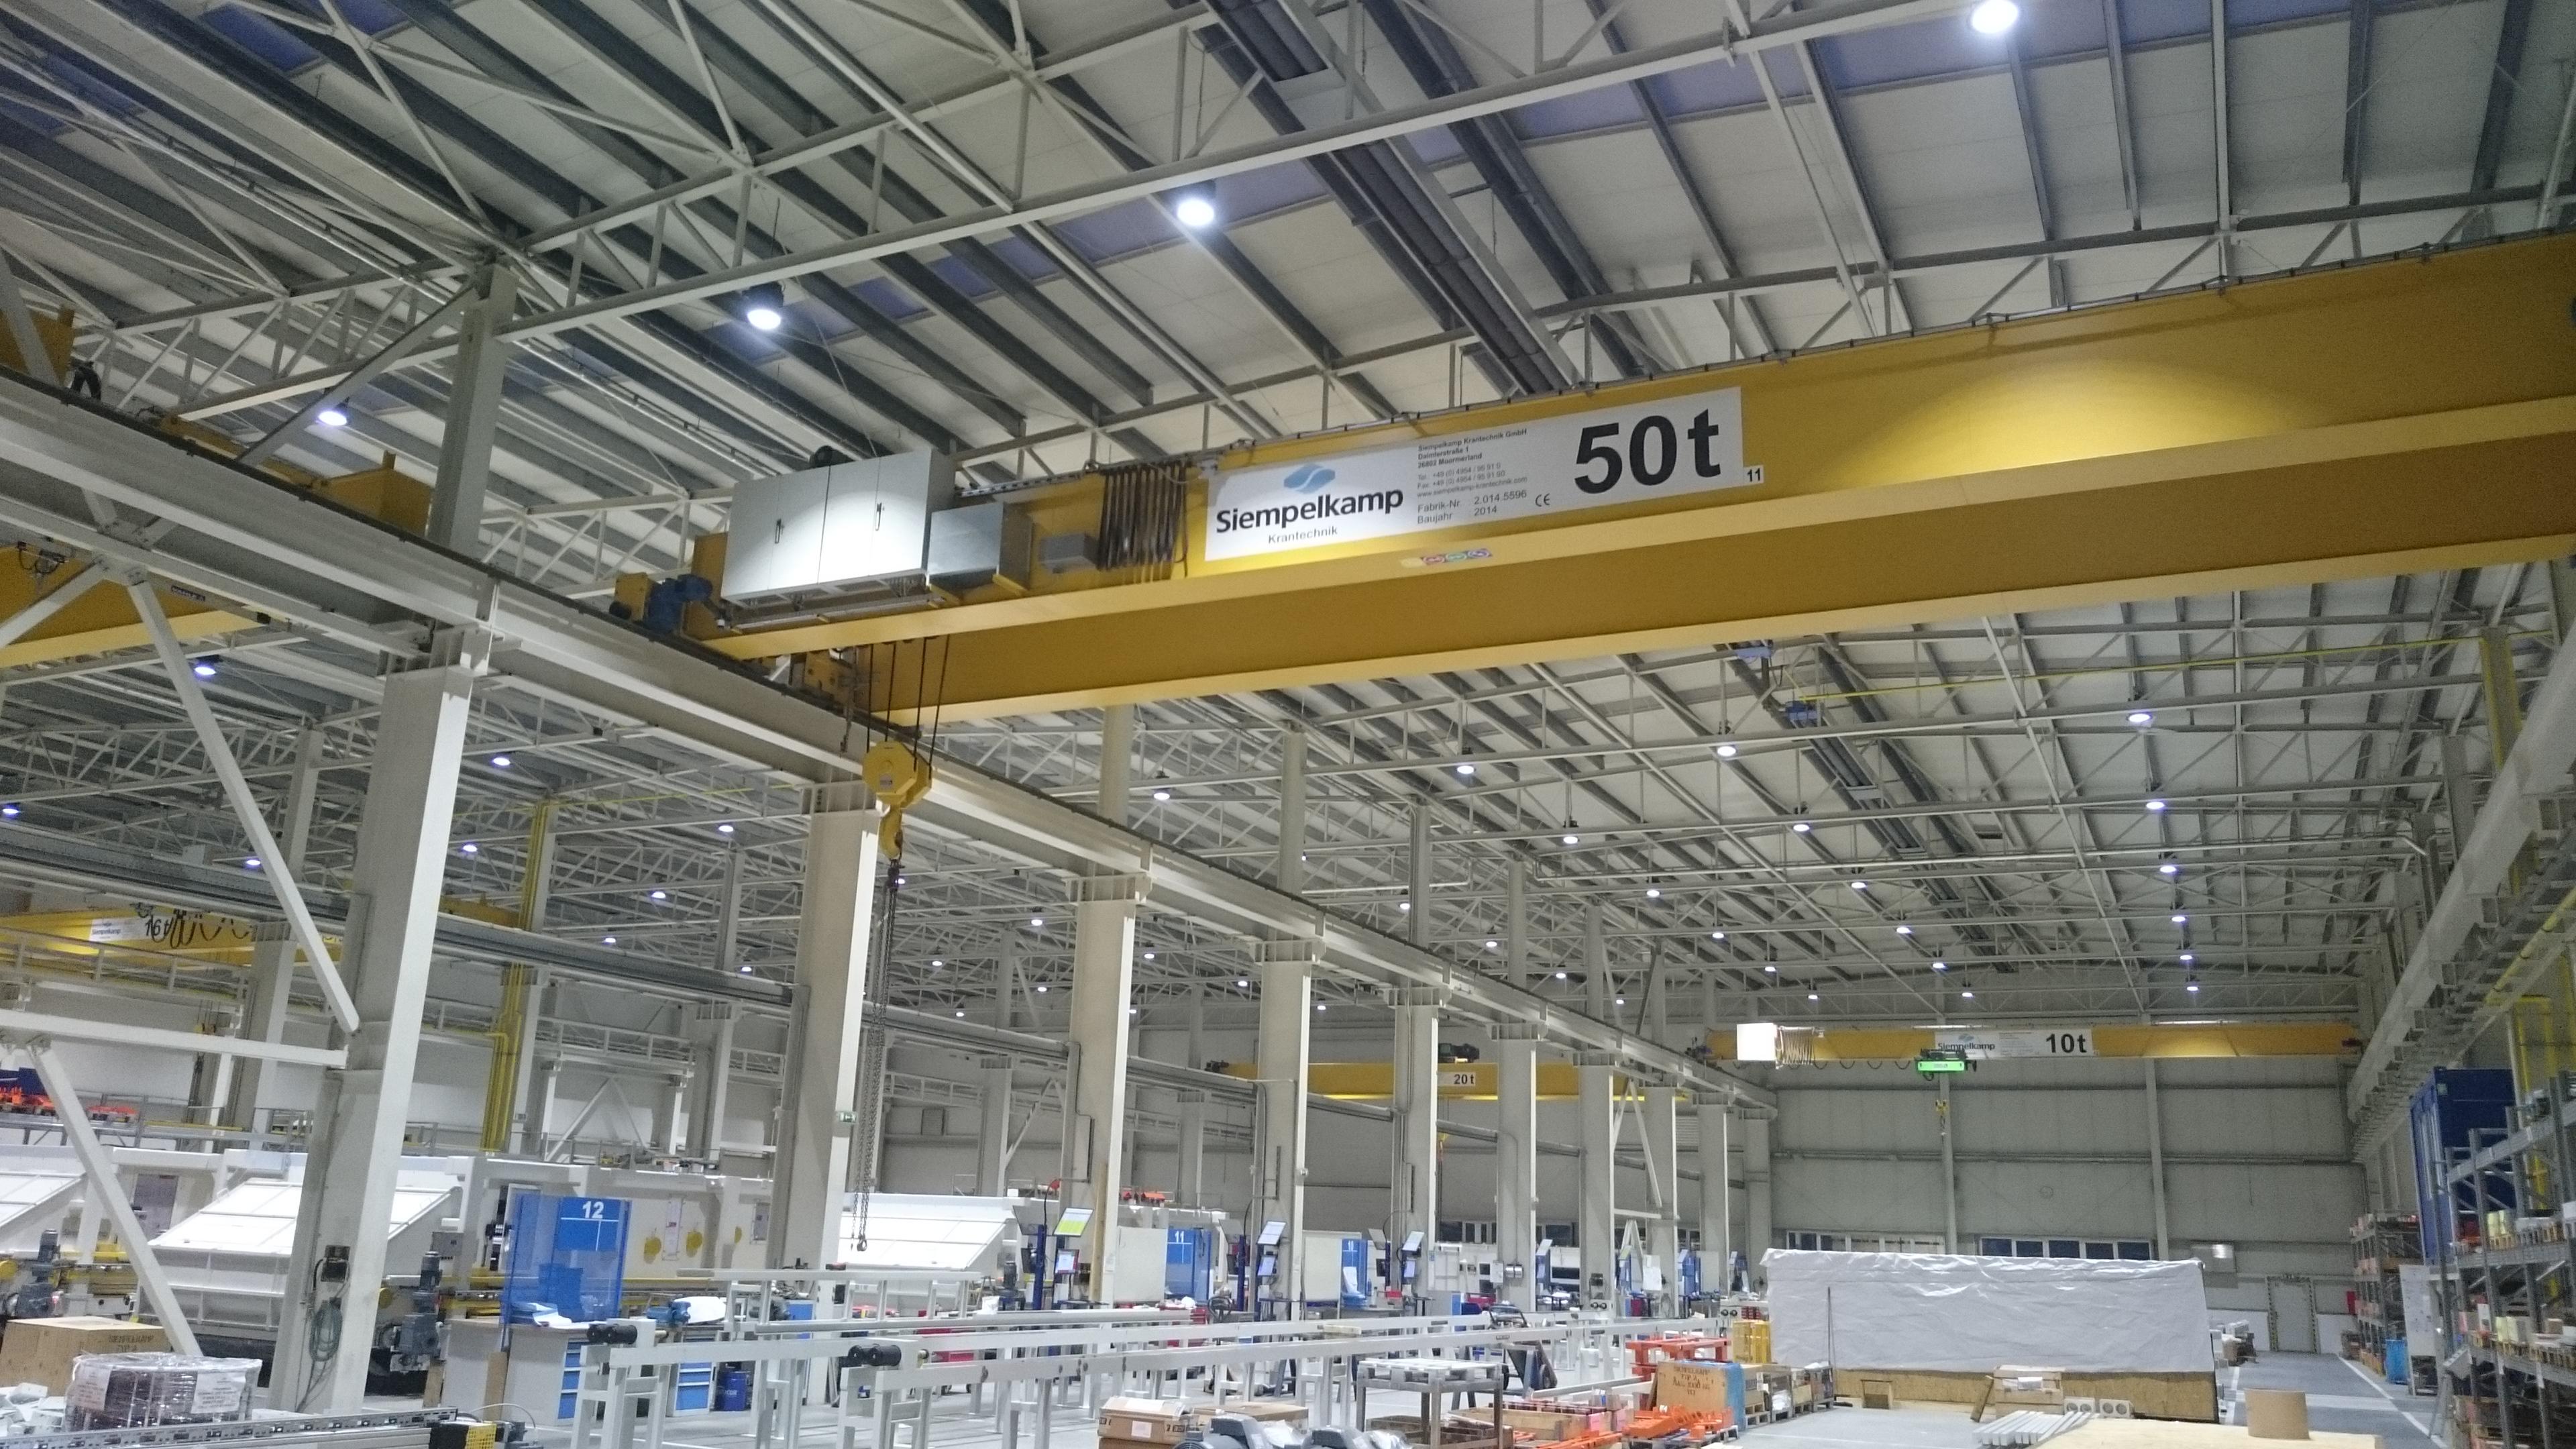 Průmyslová svítidla SIKOV lighting ve výrobě Siempelkamp s.r.o.